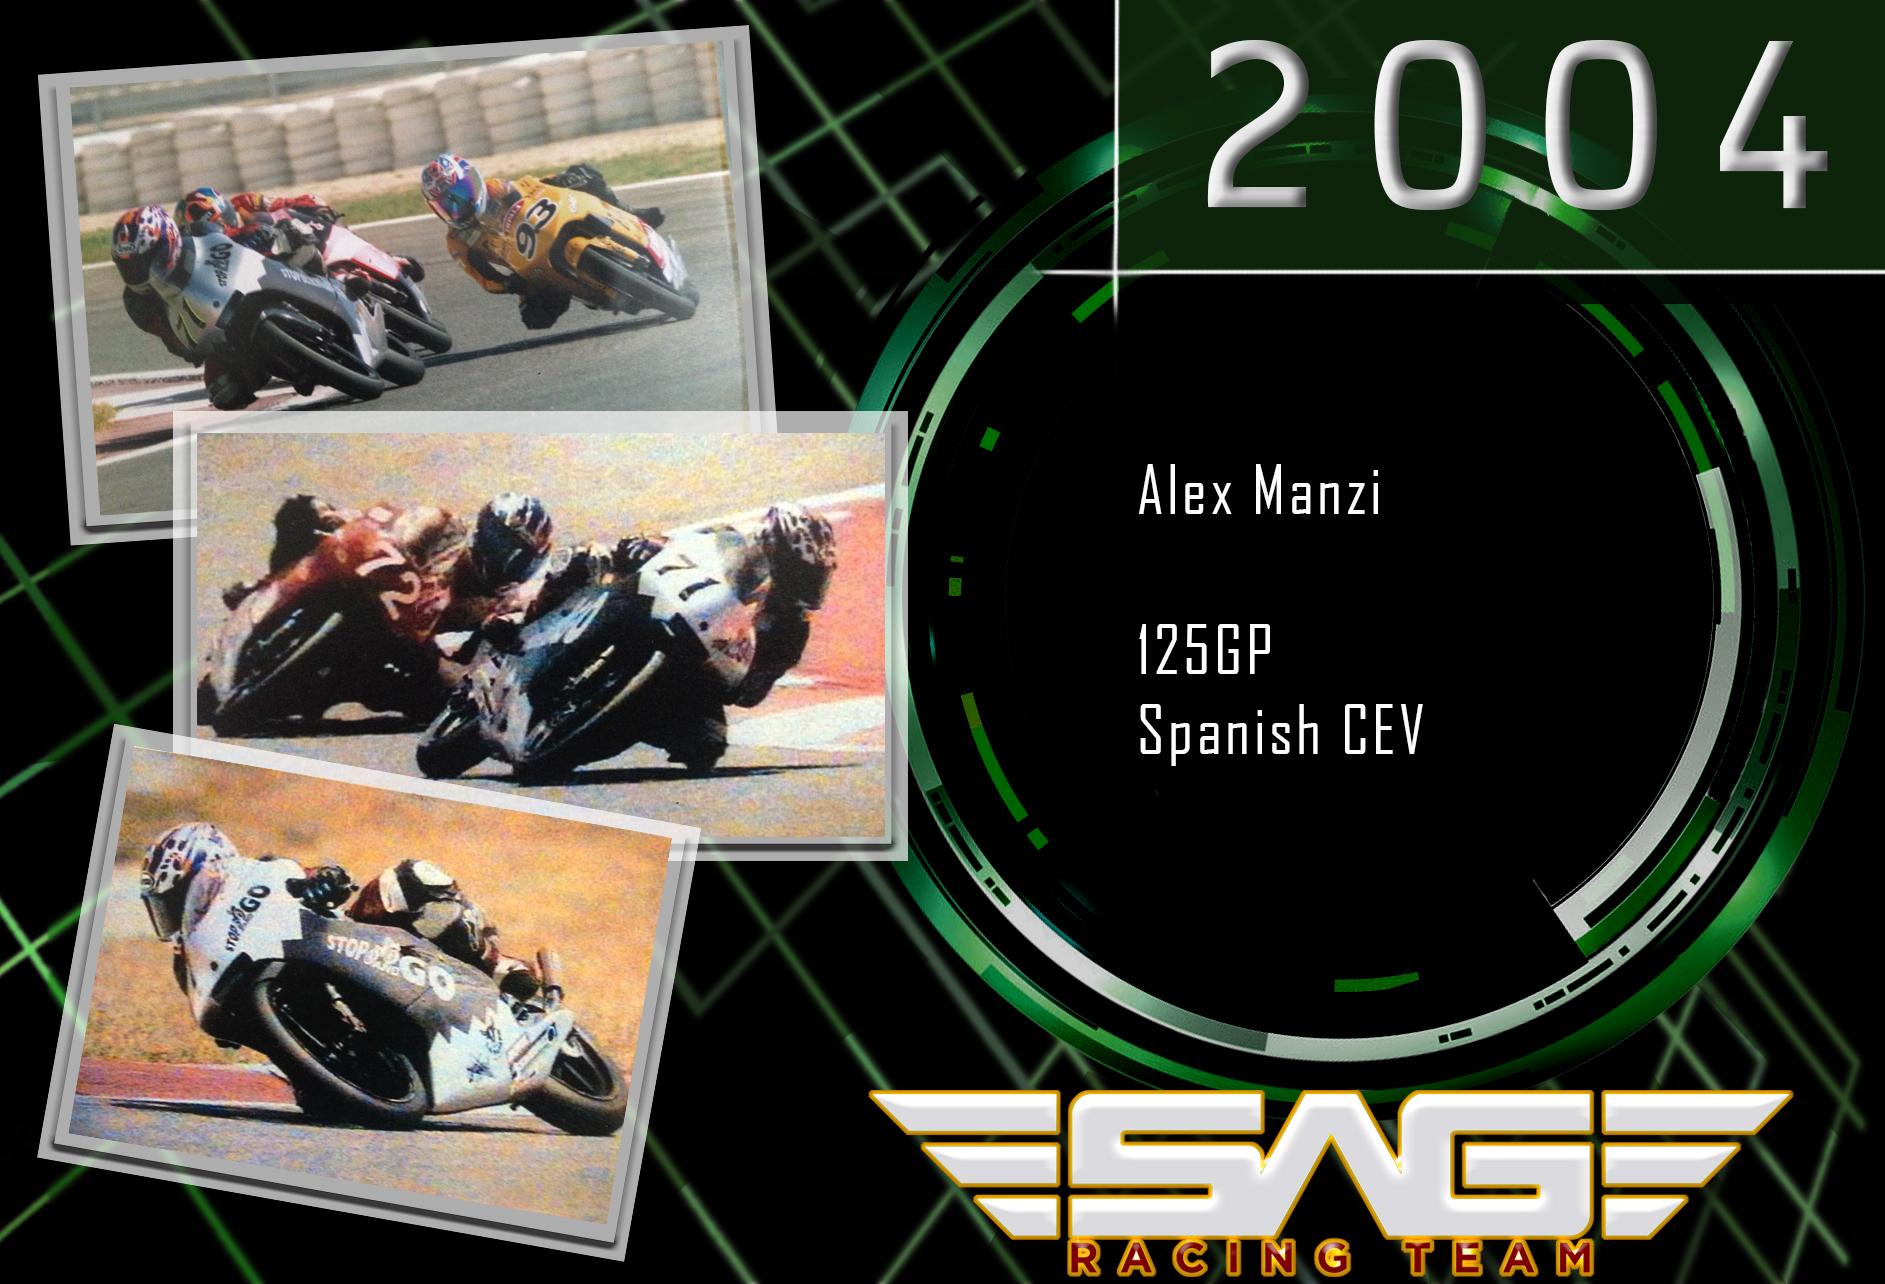 CEV Rider Alex Manzi (125GP)